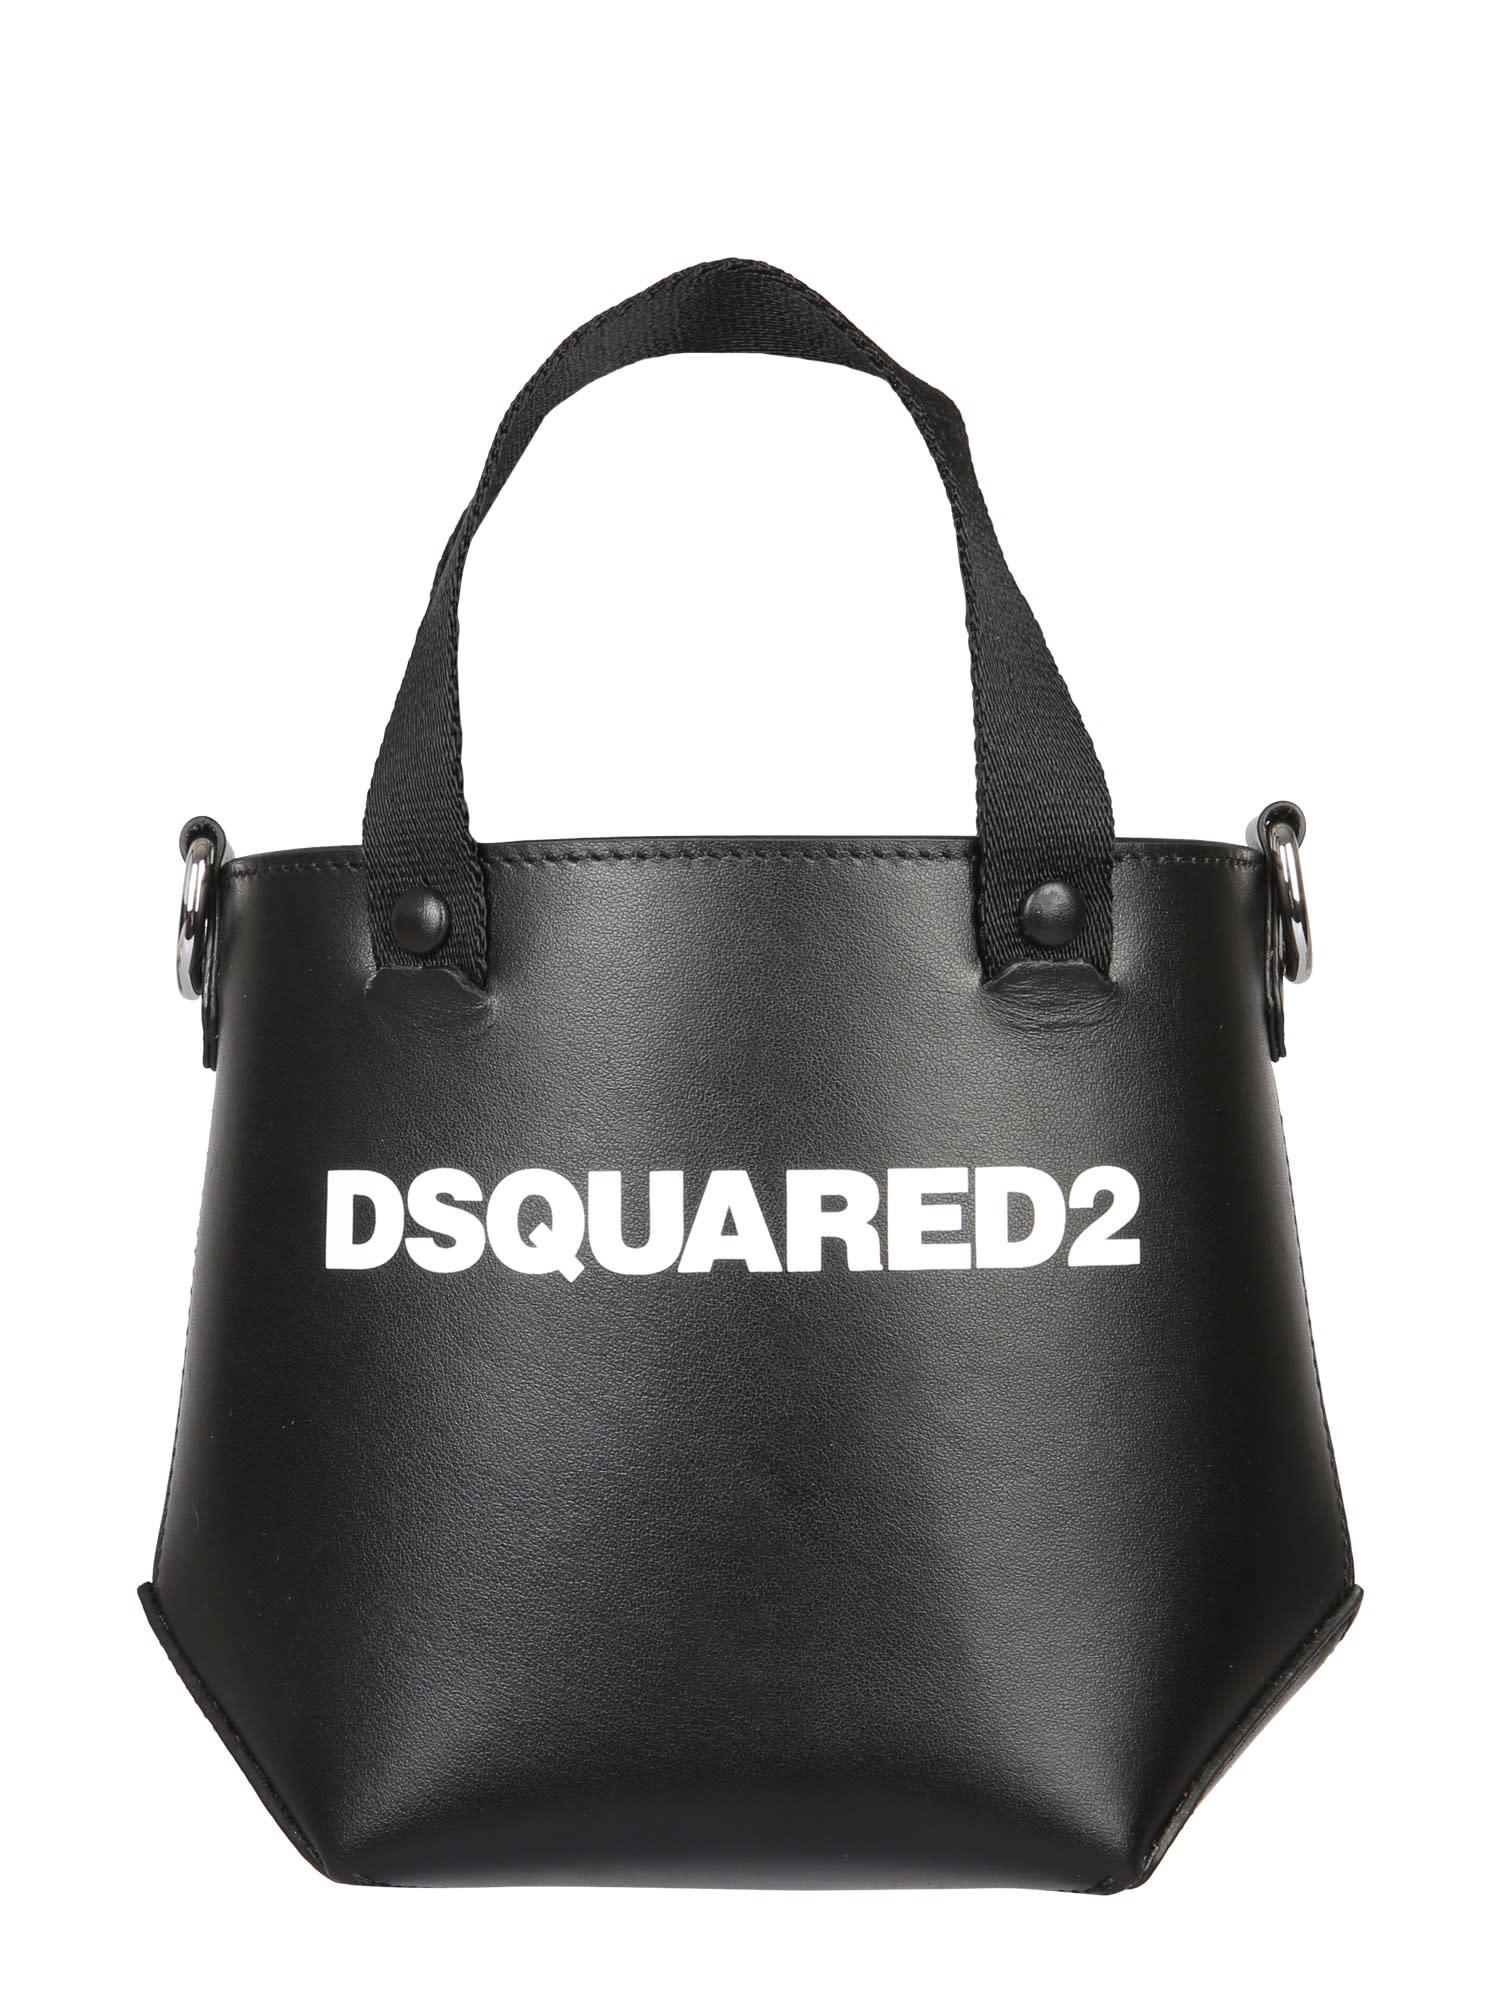 Dsquared2 MINI TOTE BAG WITH LOGO